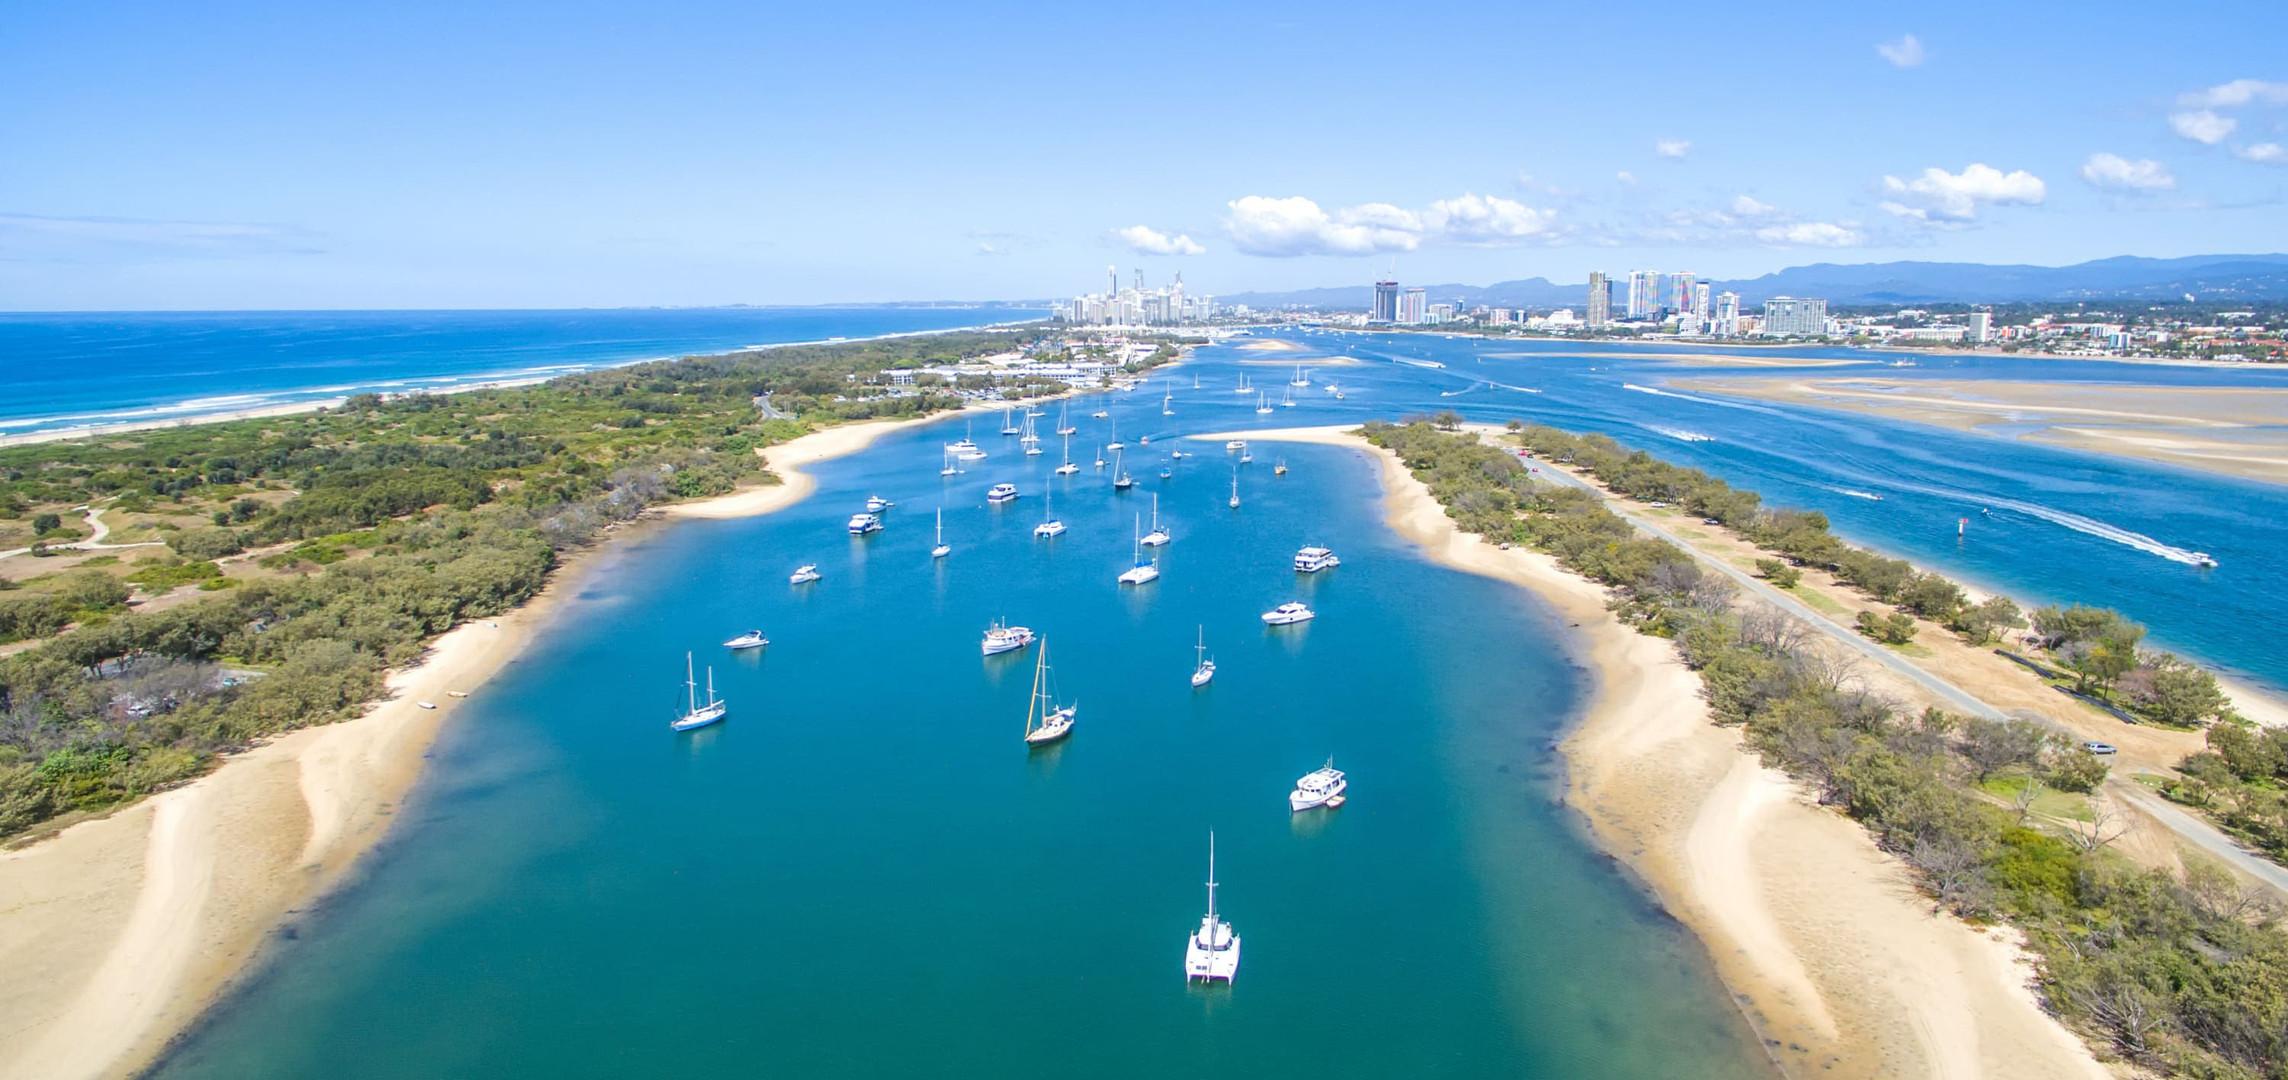 broadwater-aerial 3.jpg